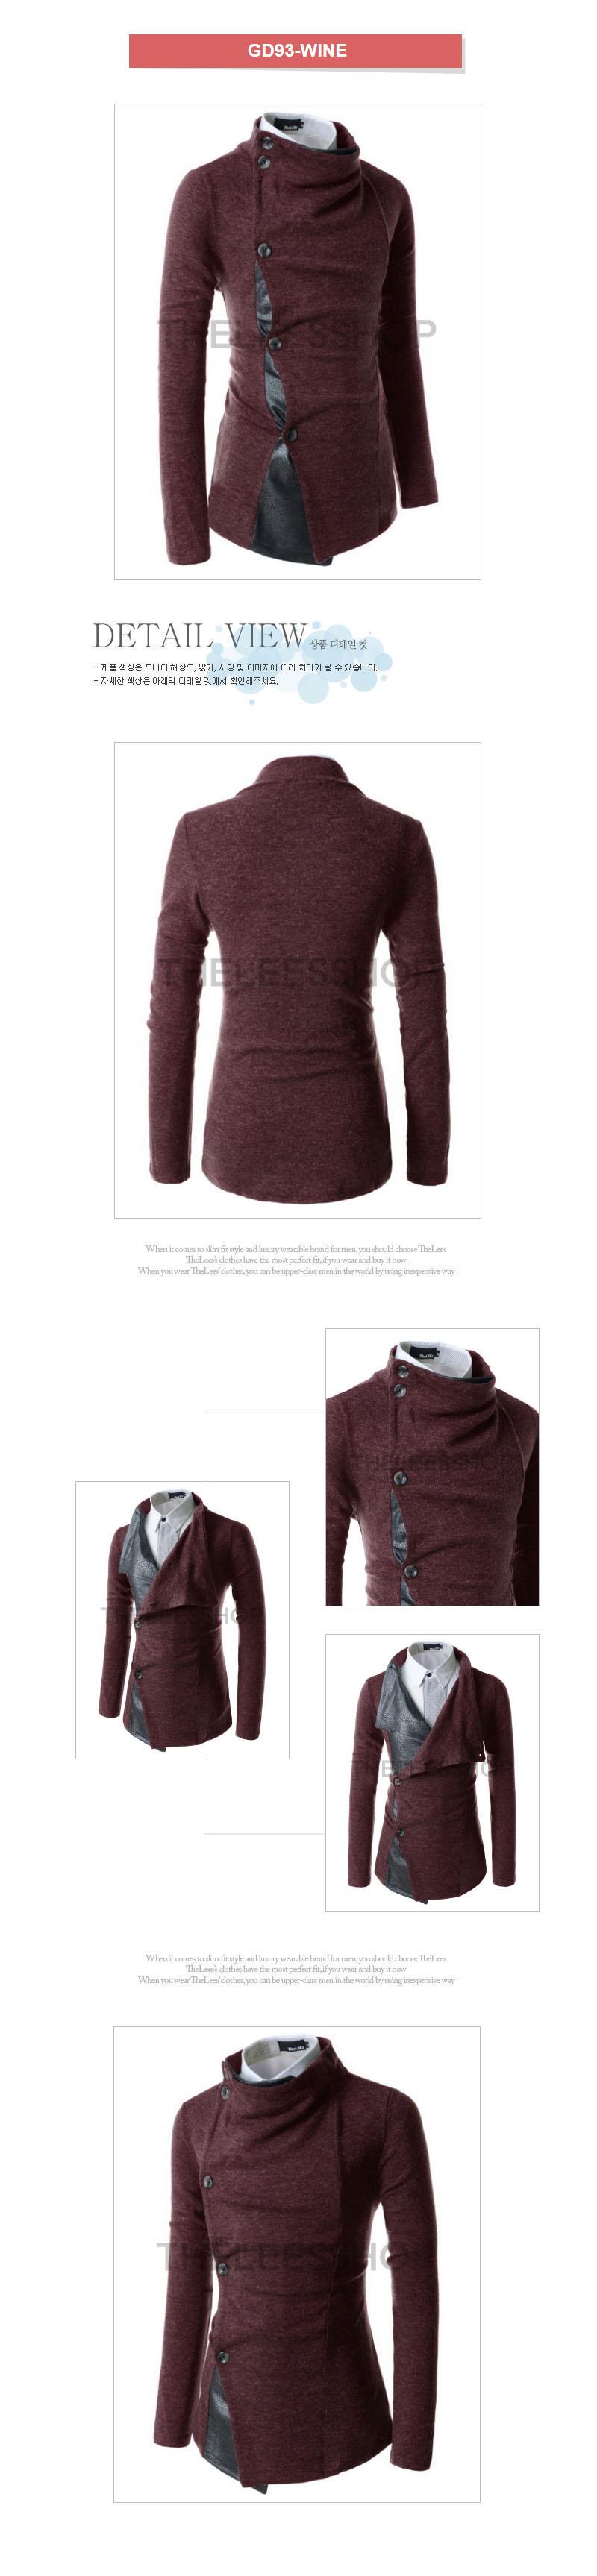 [ KOOLLOOK ] [ KoolLook ] Slim Fit 一键式开衫与金属详细信息 GD93